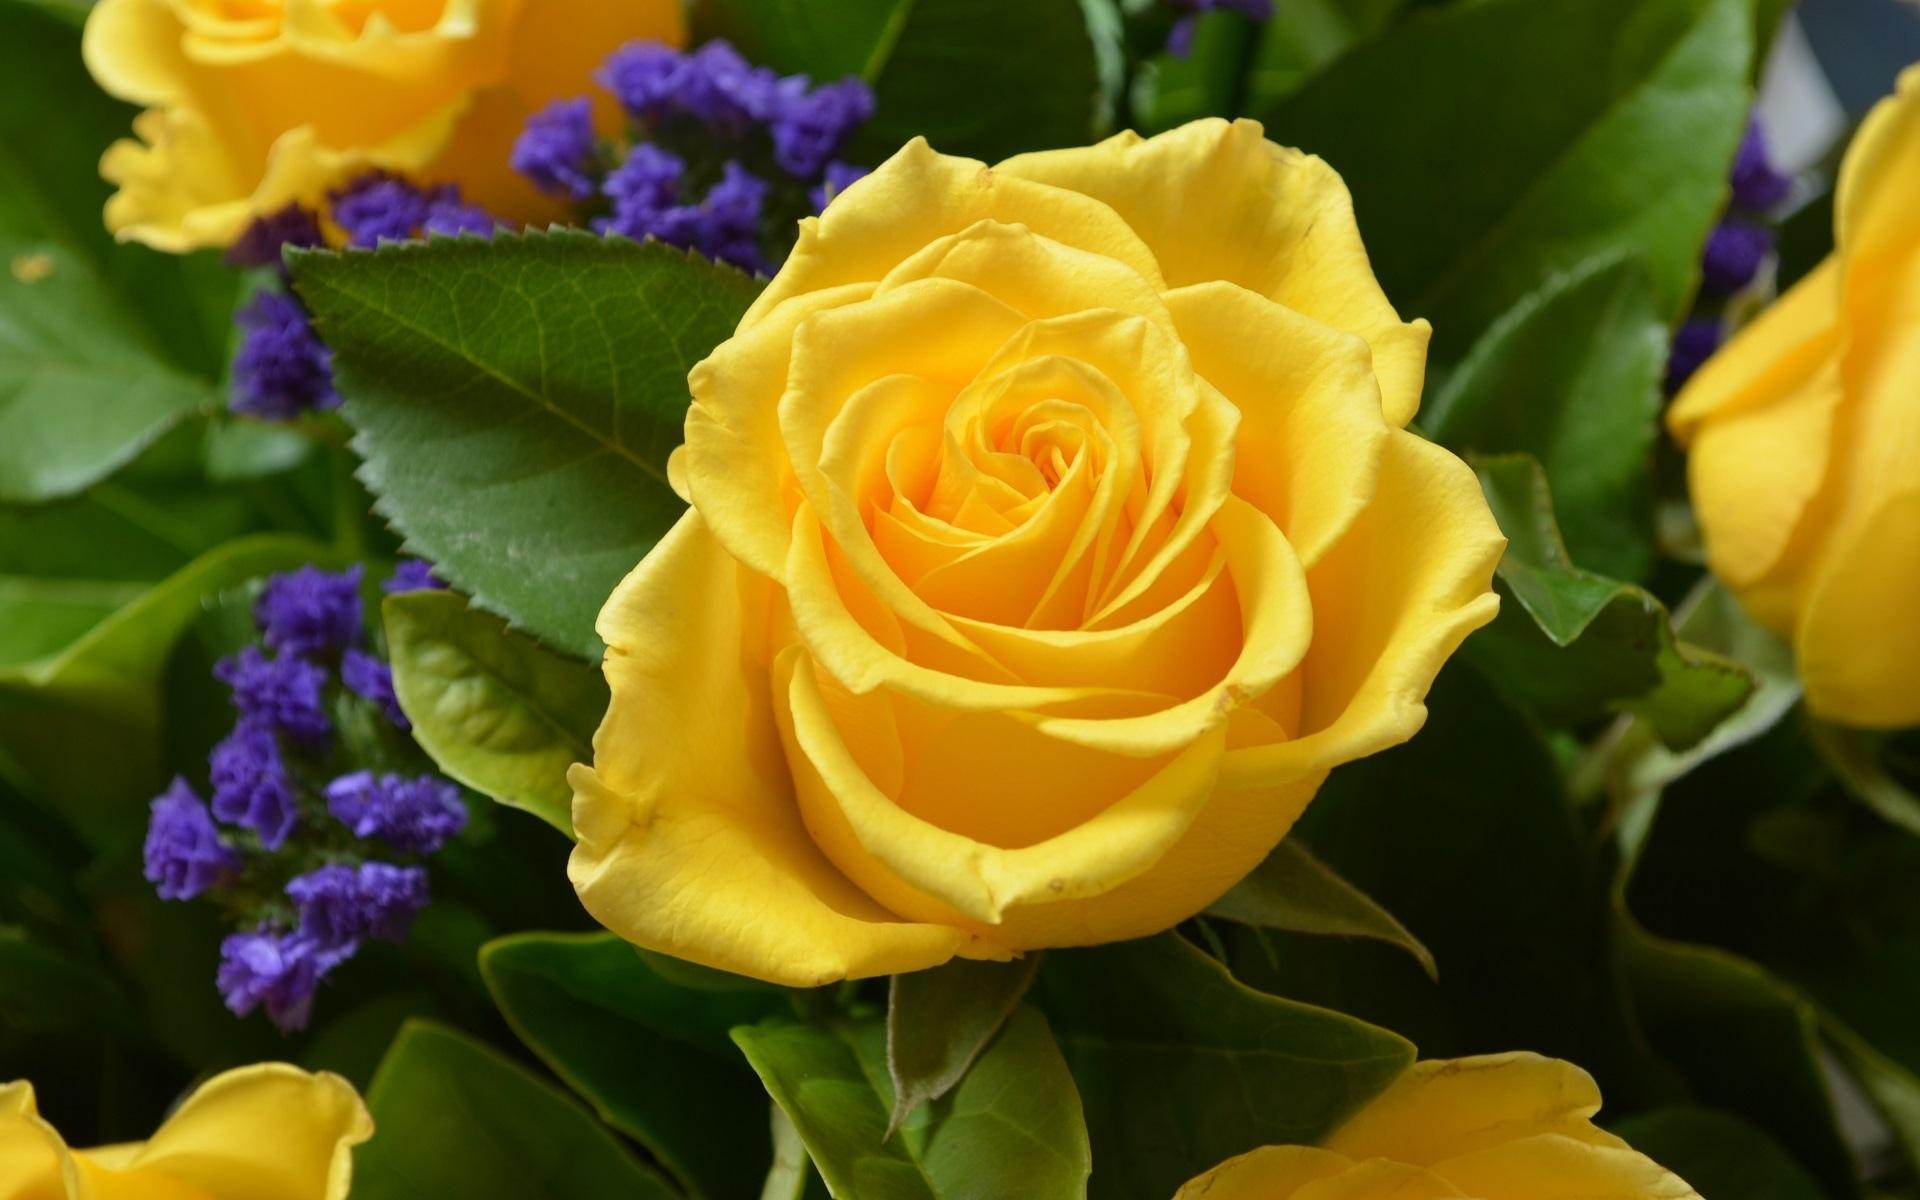 Fondos de flores wallpapers hd gratis - Rose flower images full size hd ...